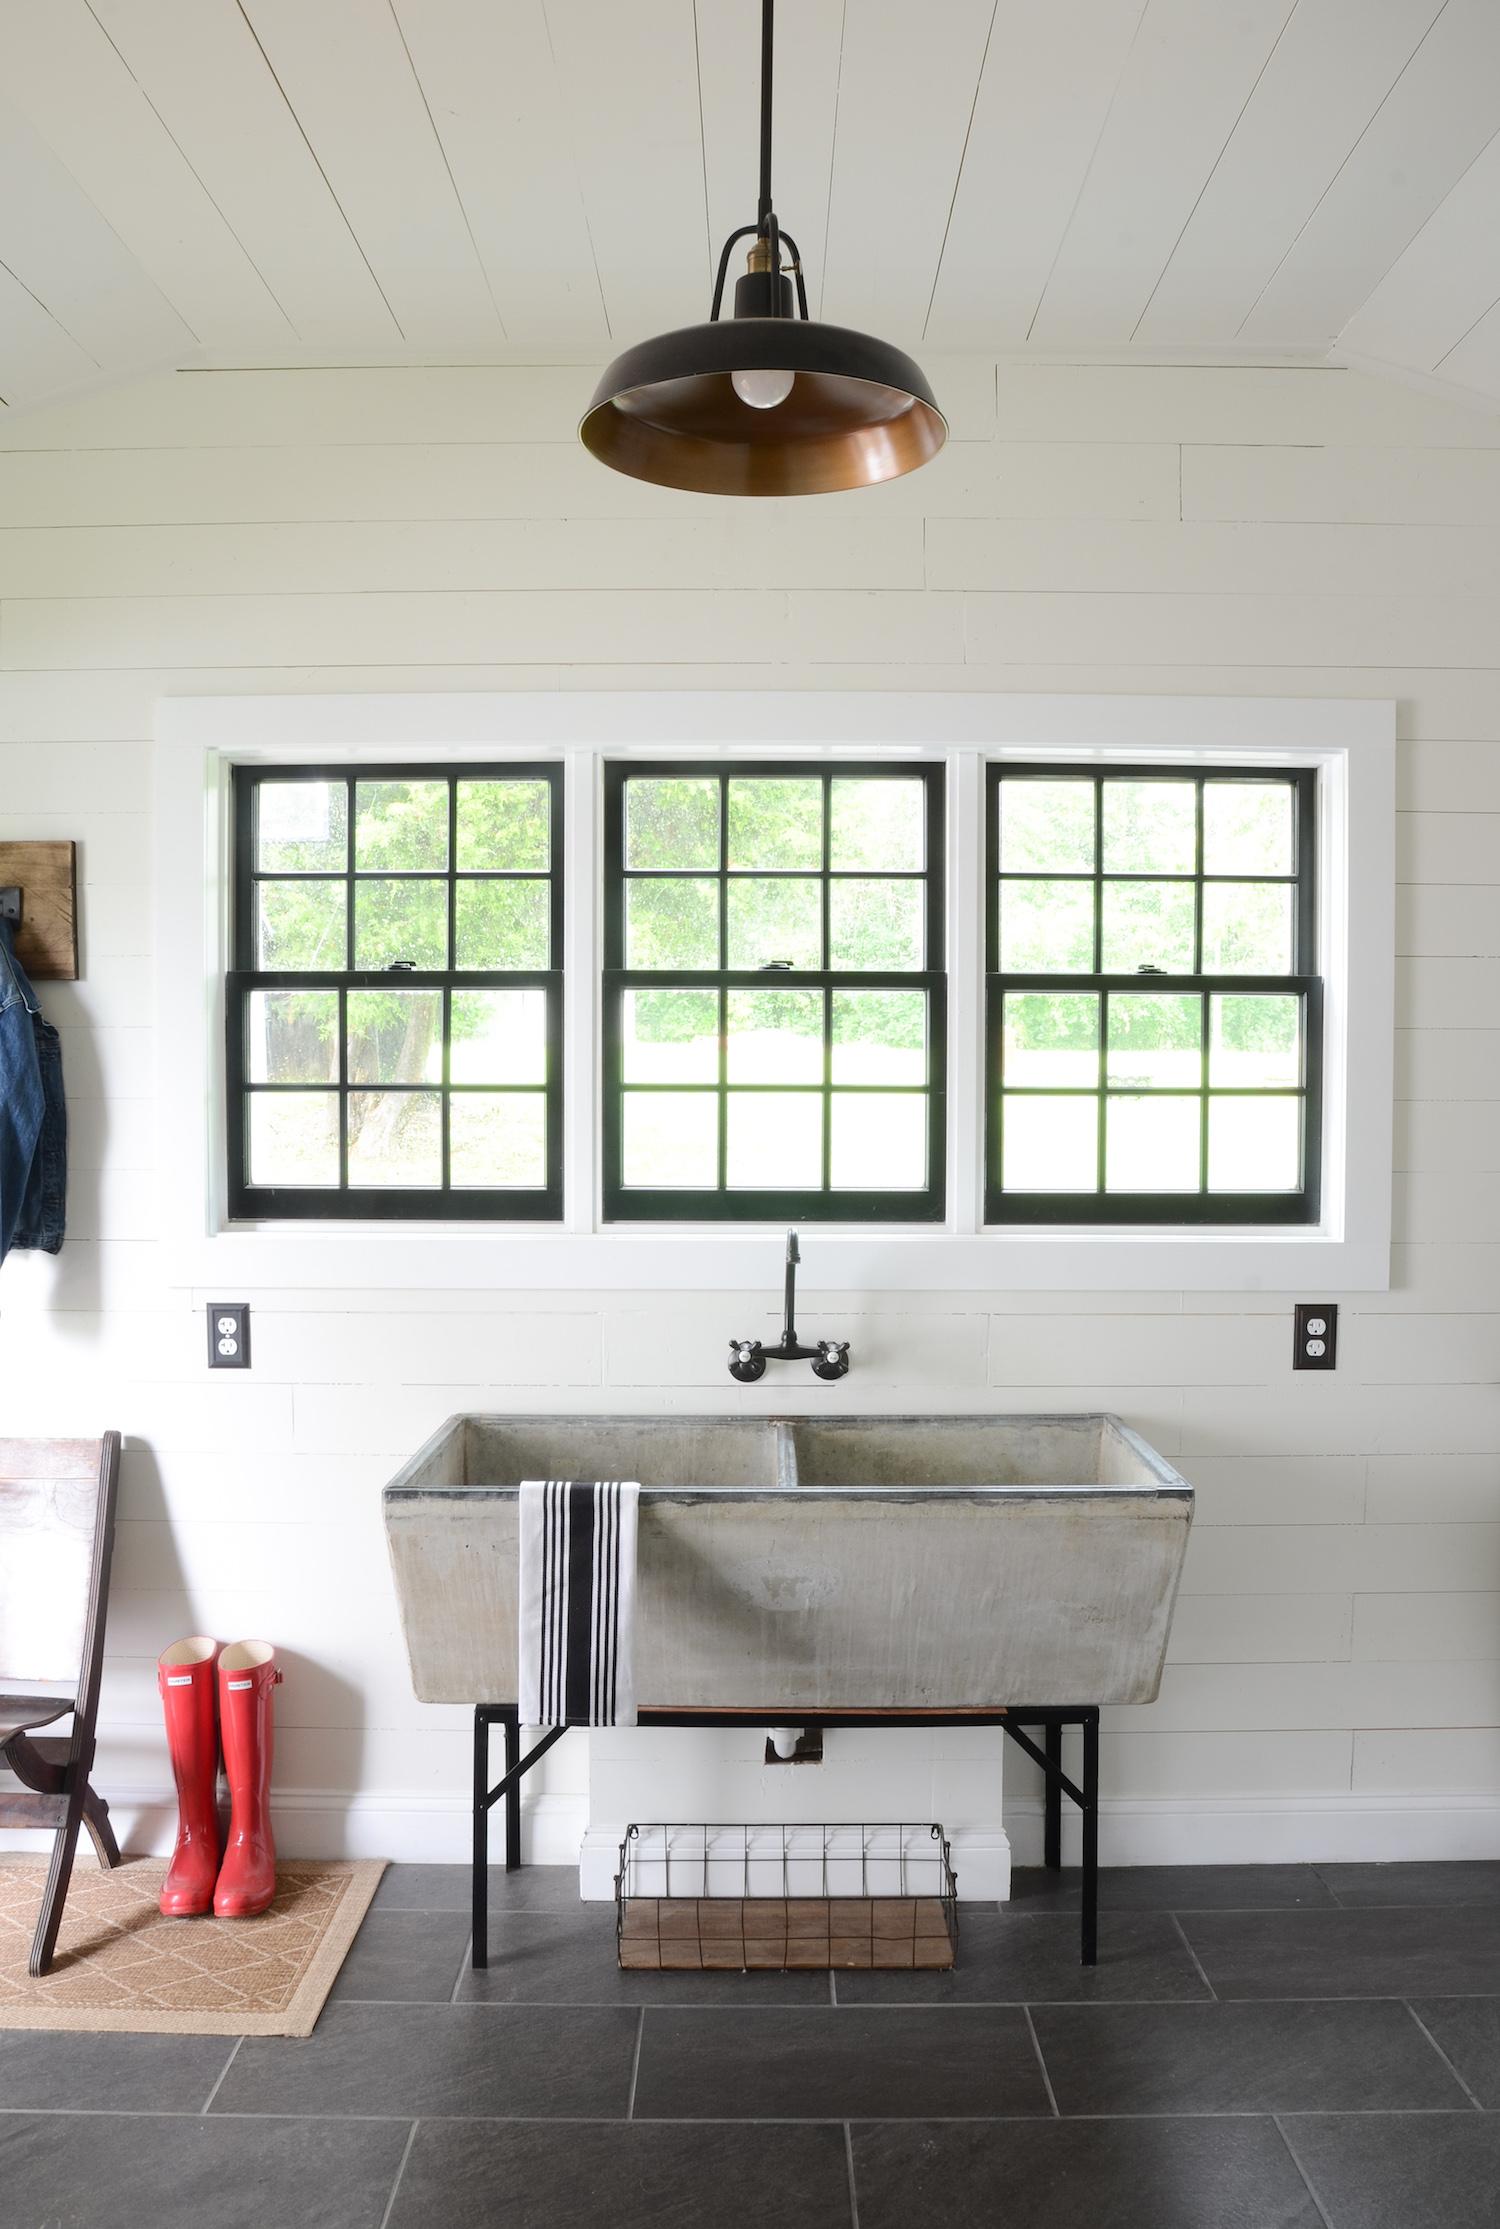 Laundry Room Pendant Light